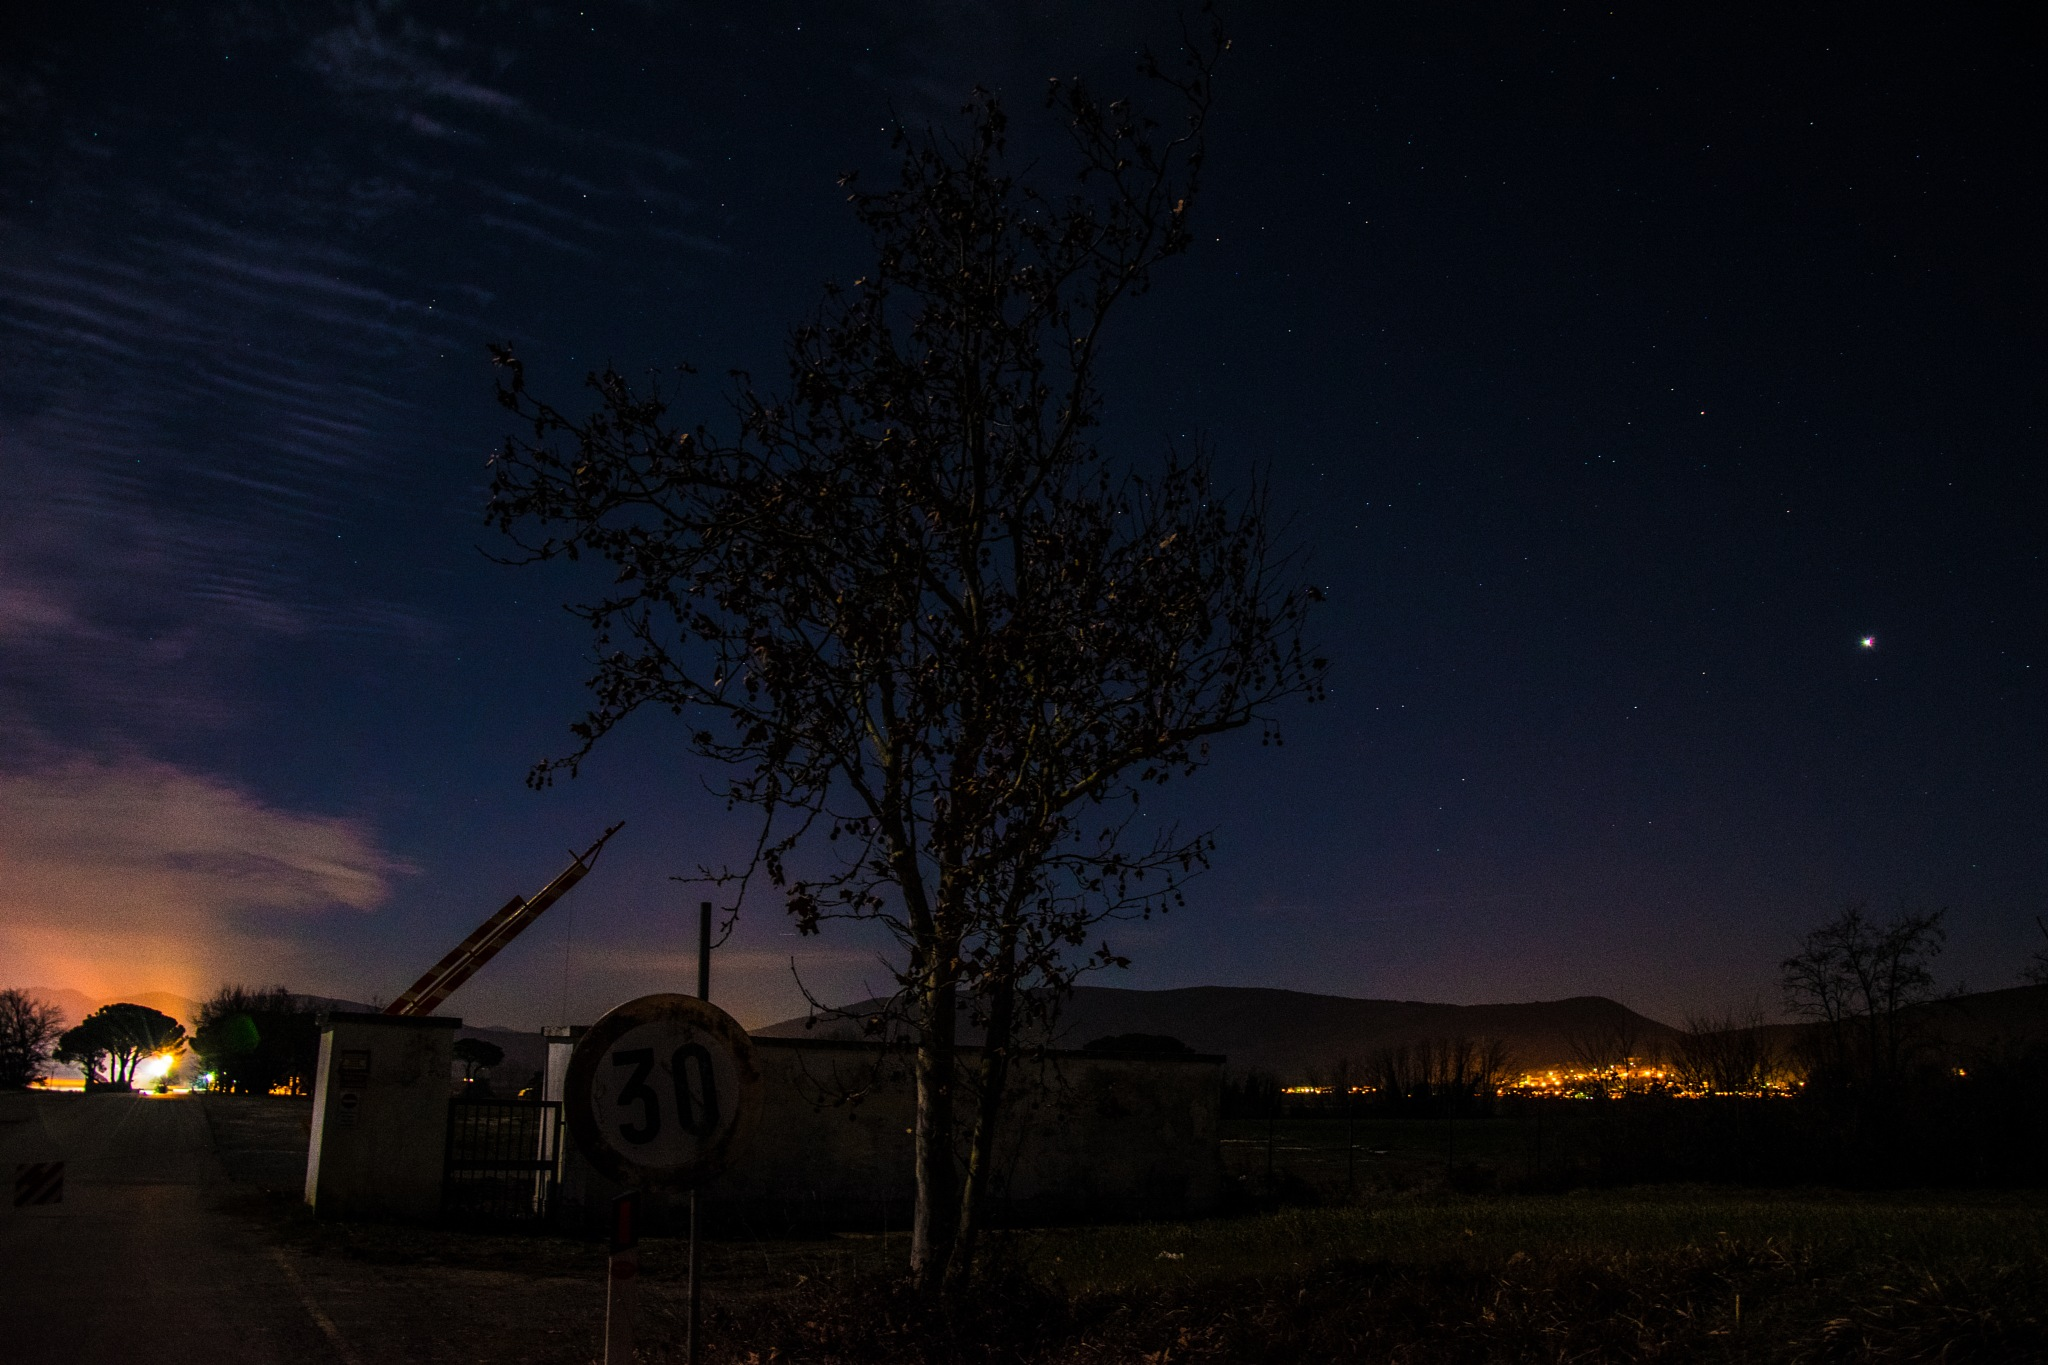 Goodnight  by CrisPhotoLive